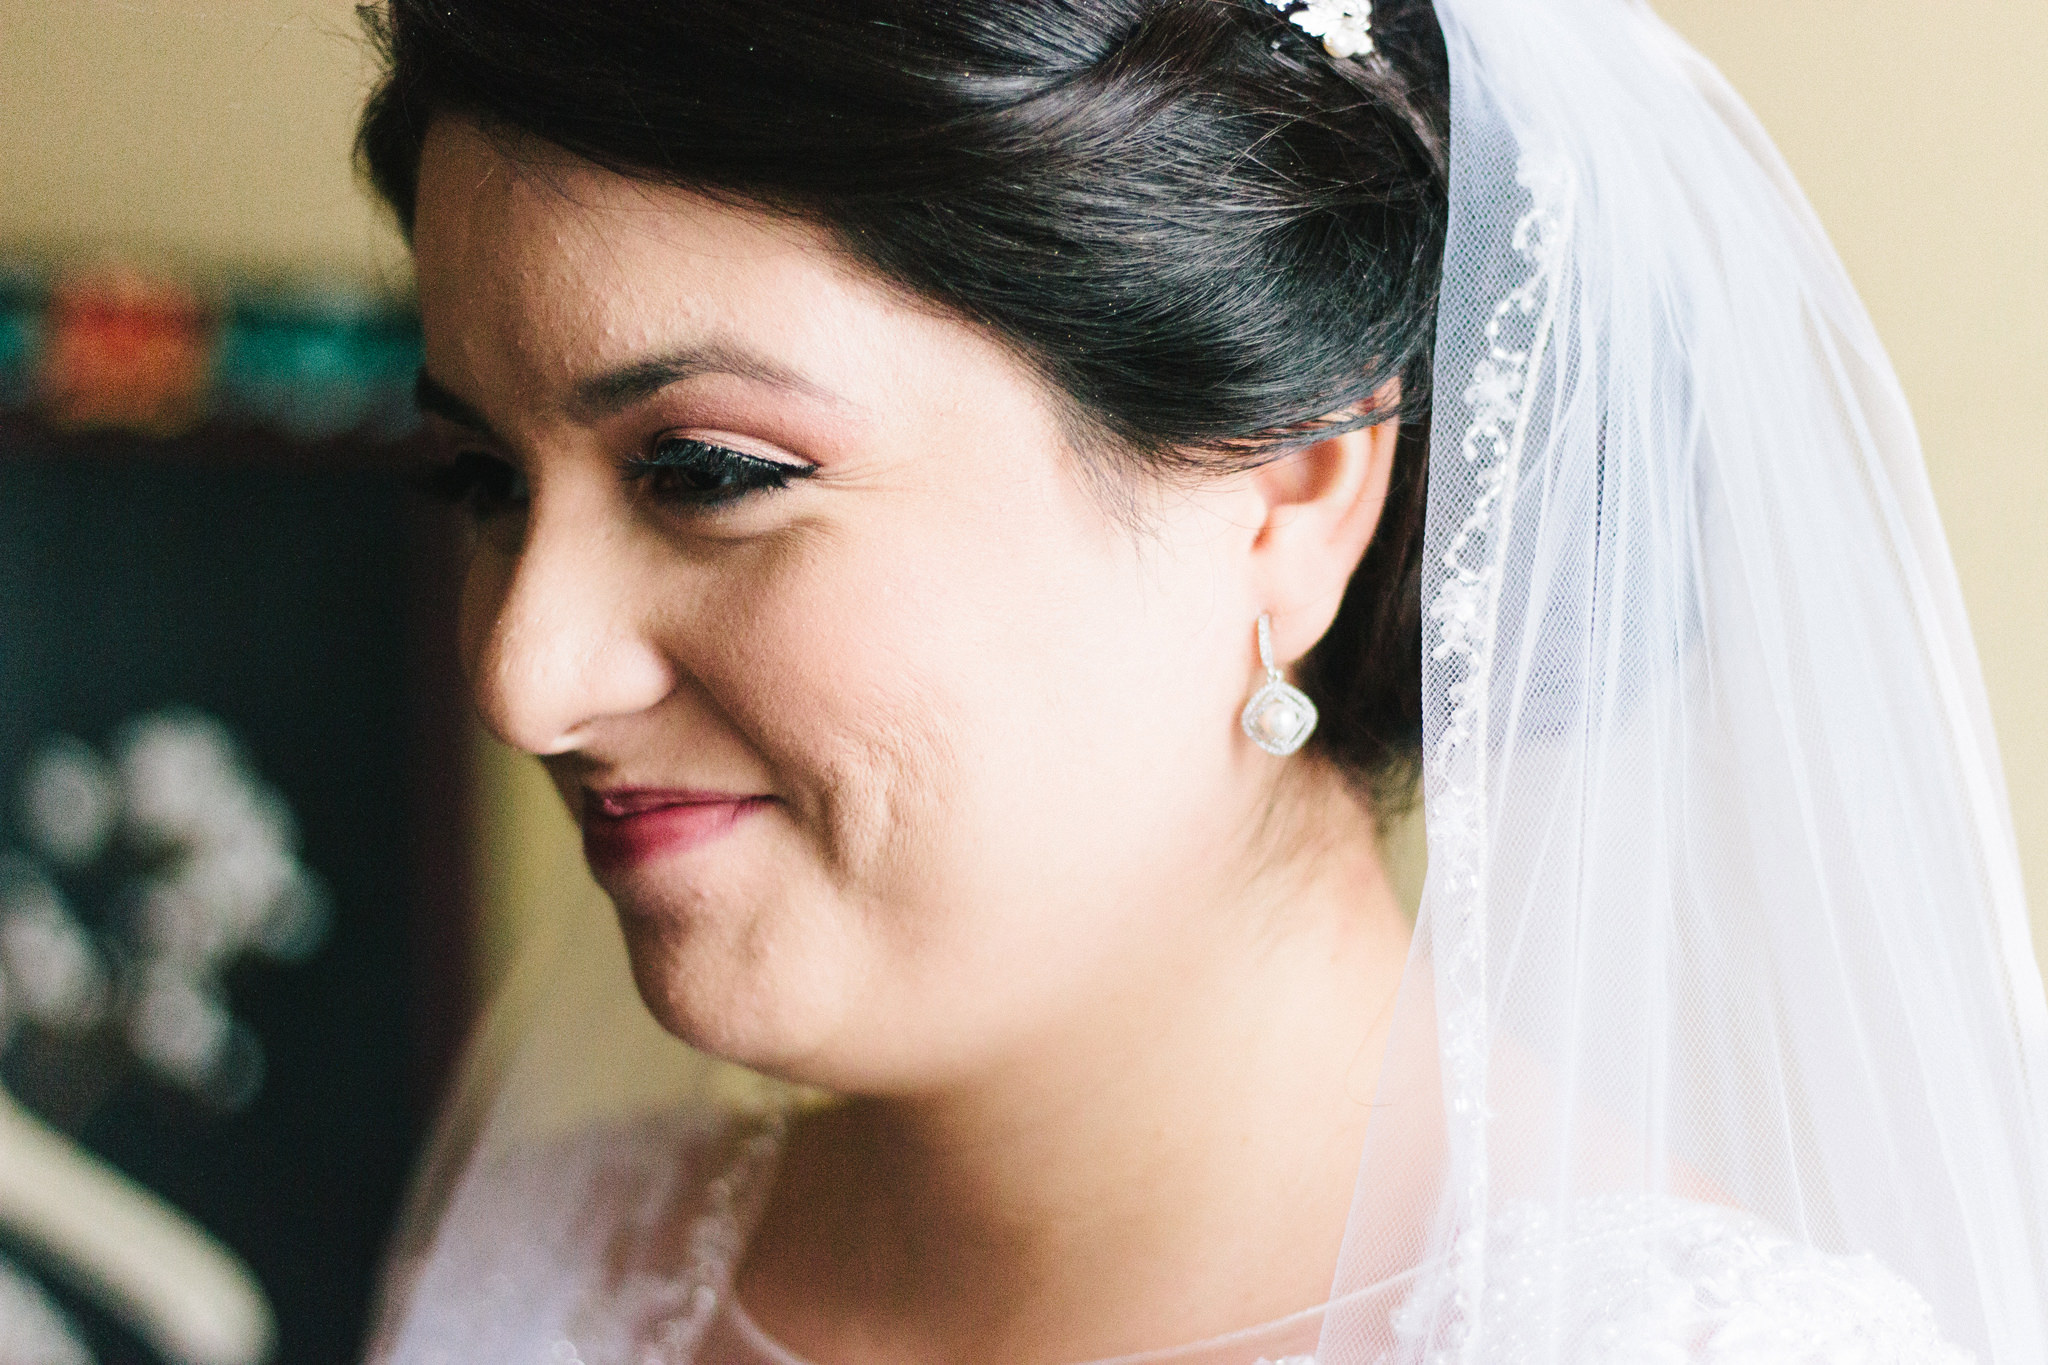 002-rempel-photography-chicago-wedding-inspiration-susan-daniel-michigan-metro-detroit-christian-church-holly-vault-cupcakes-and-kisses.jpg